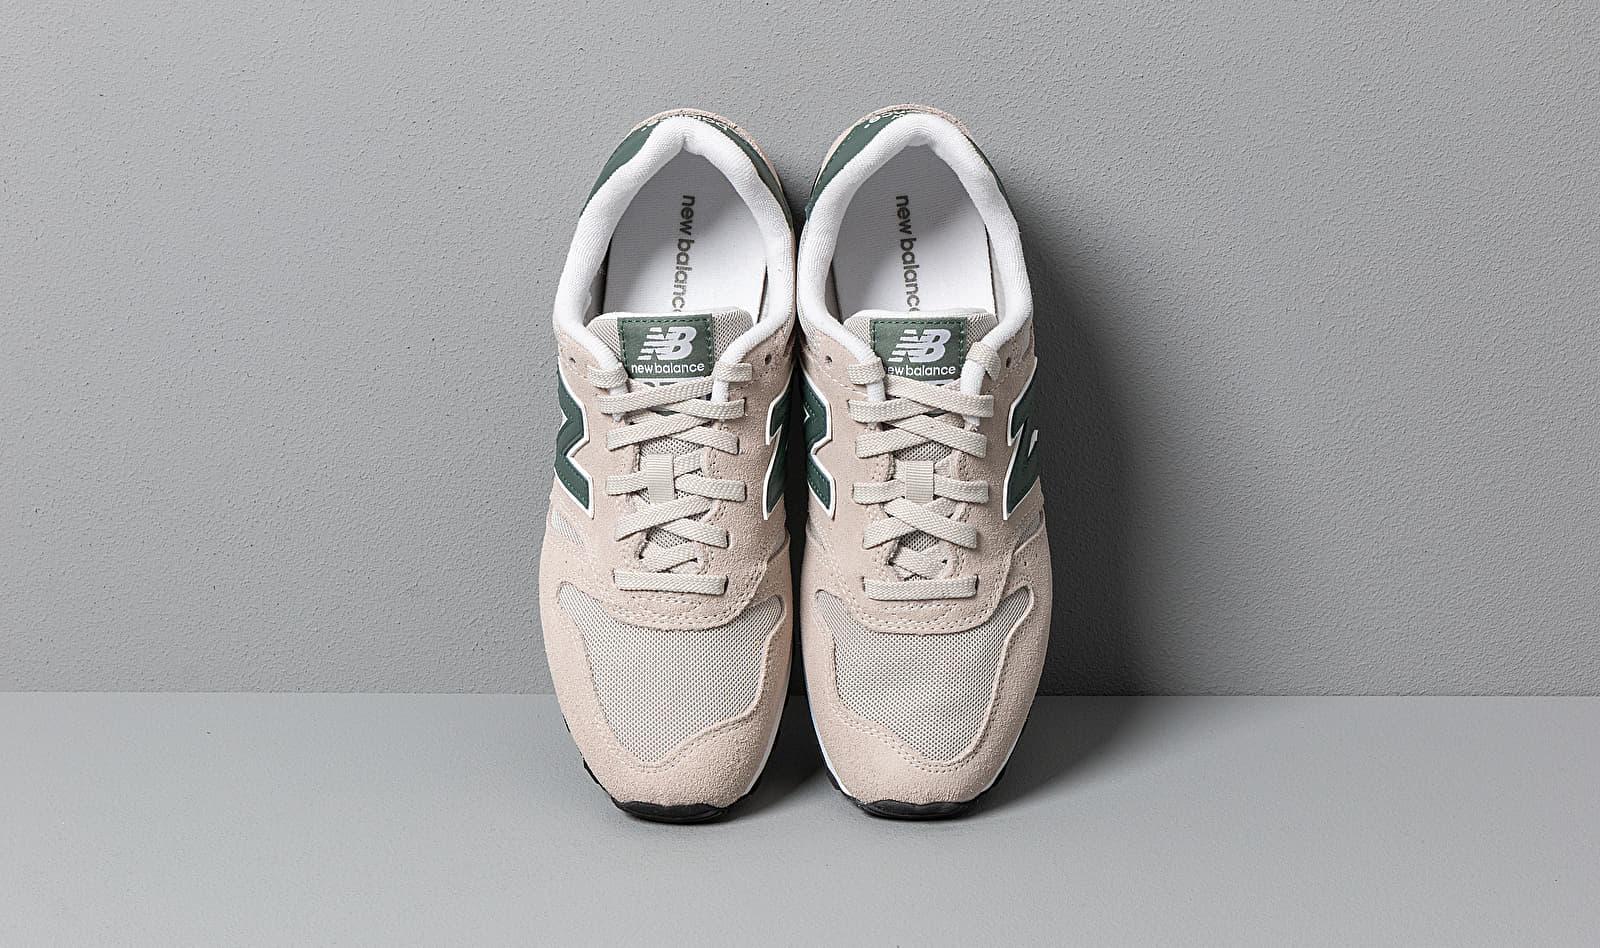 373 Grey/ Green